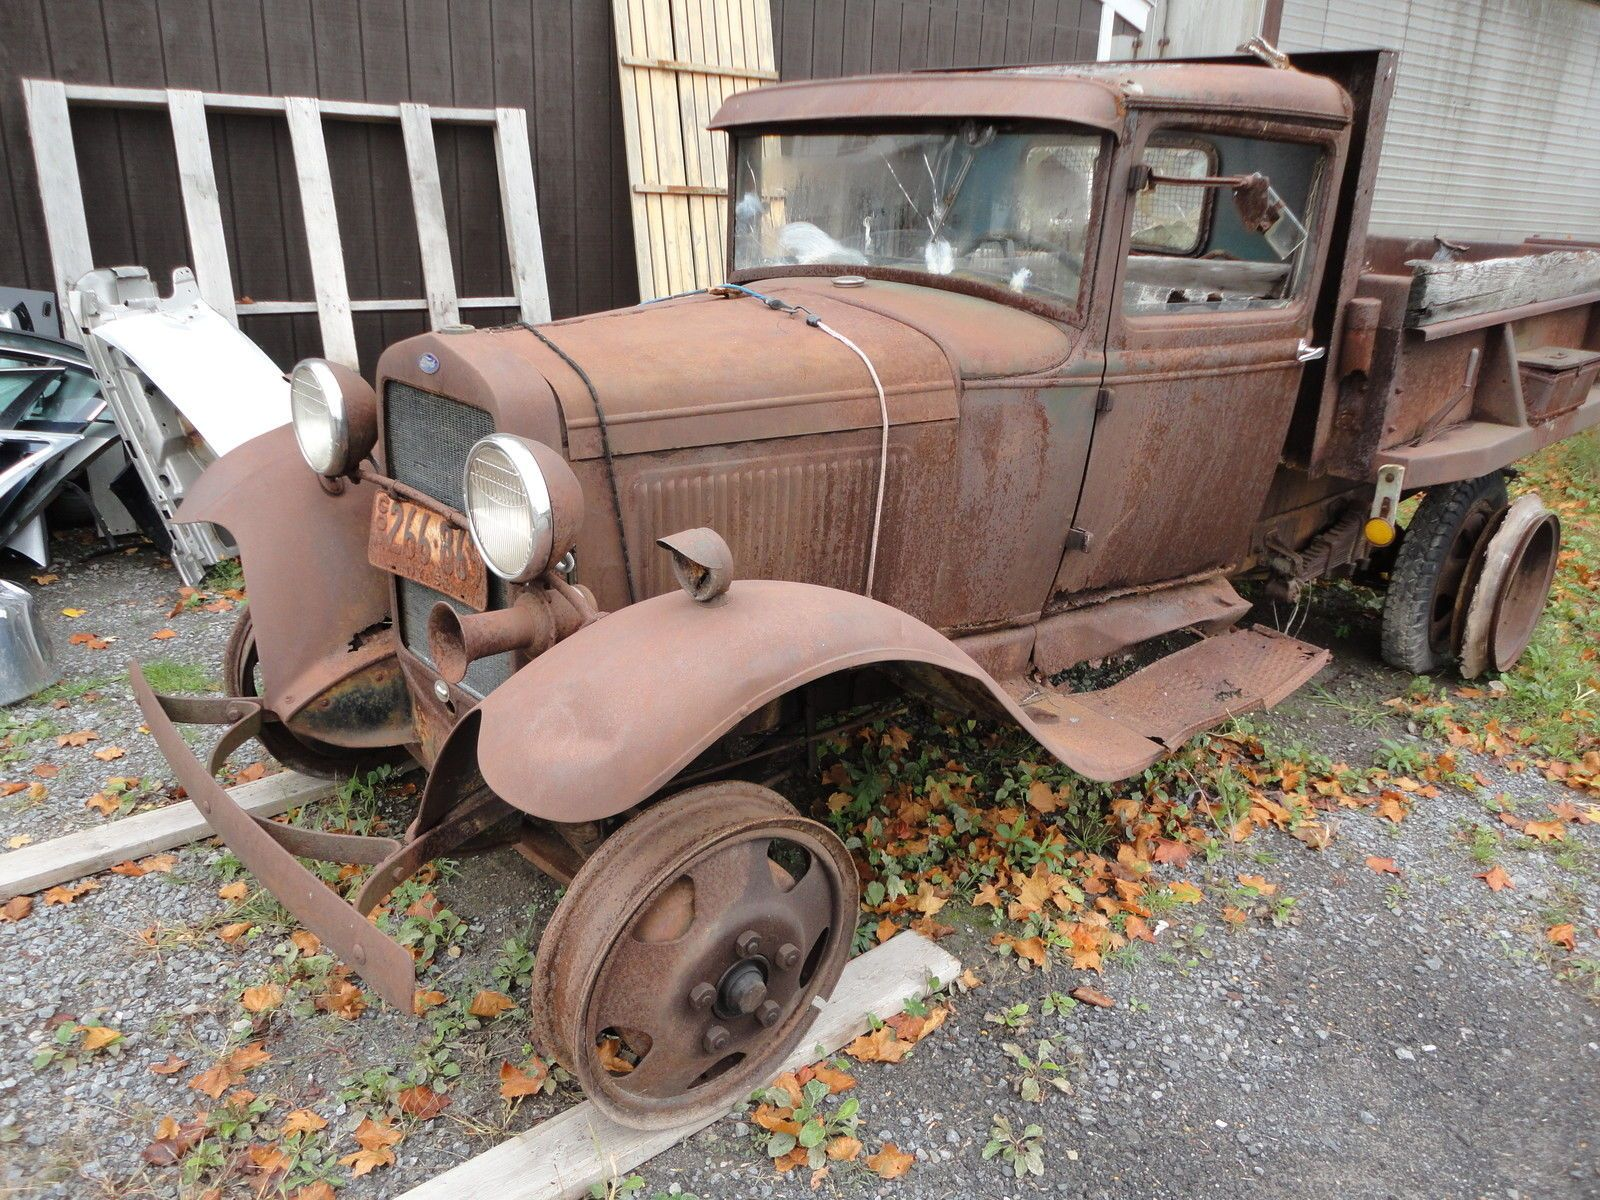 ford model ar junk carz pinterest casse auto motos anciennes et voiture americaine. Black Bedroom Furniture Sets. Home Design Ideas